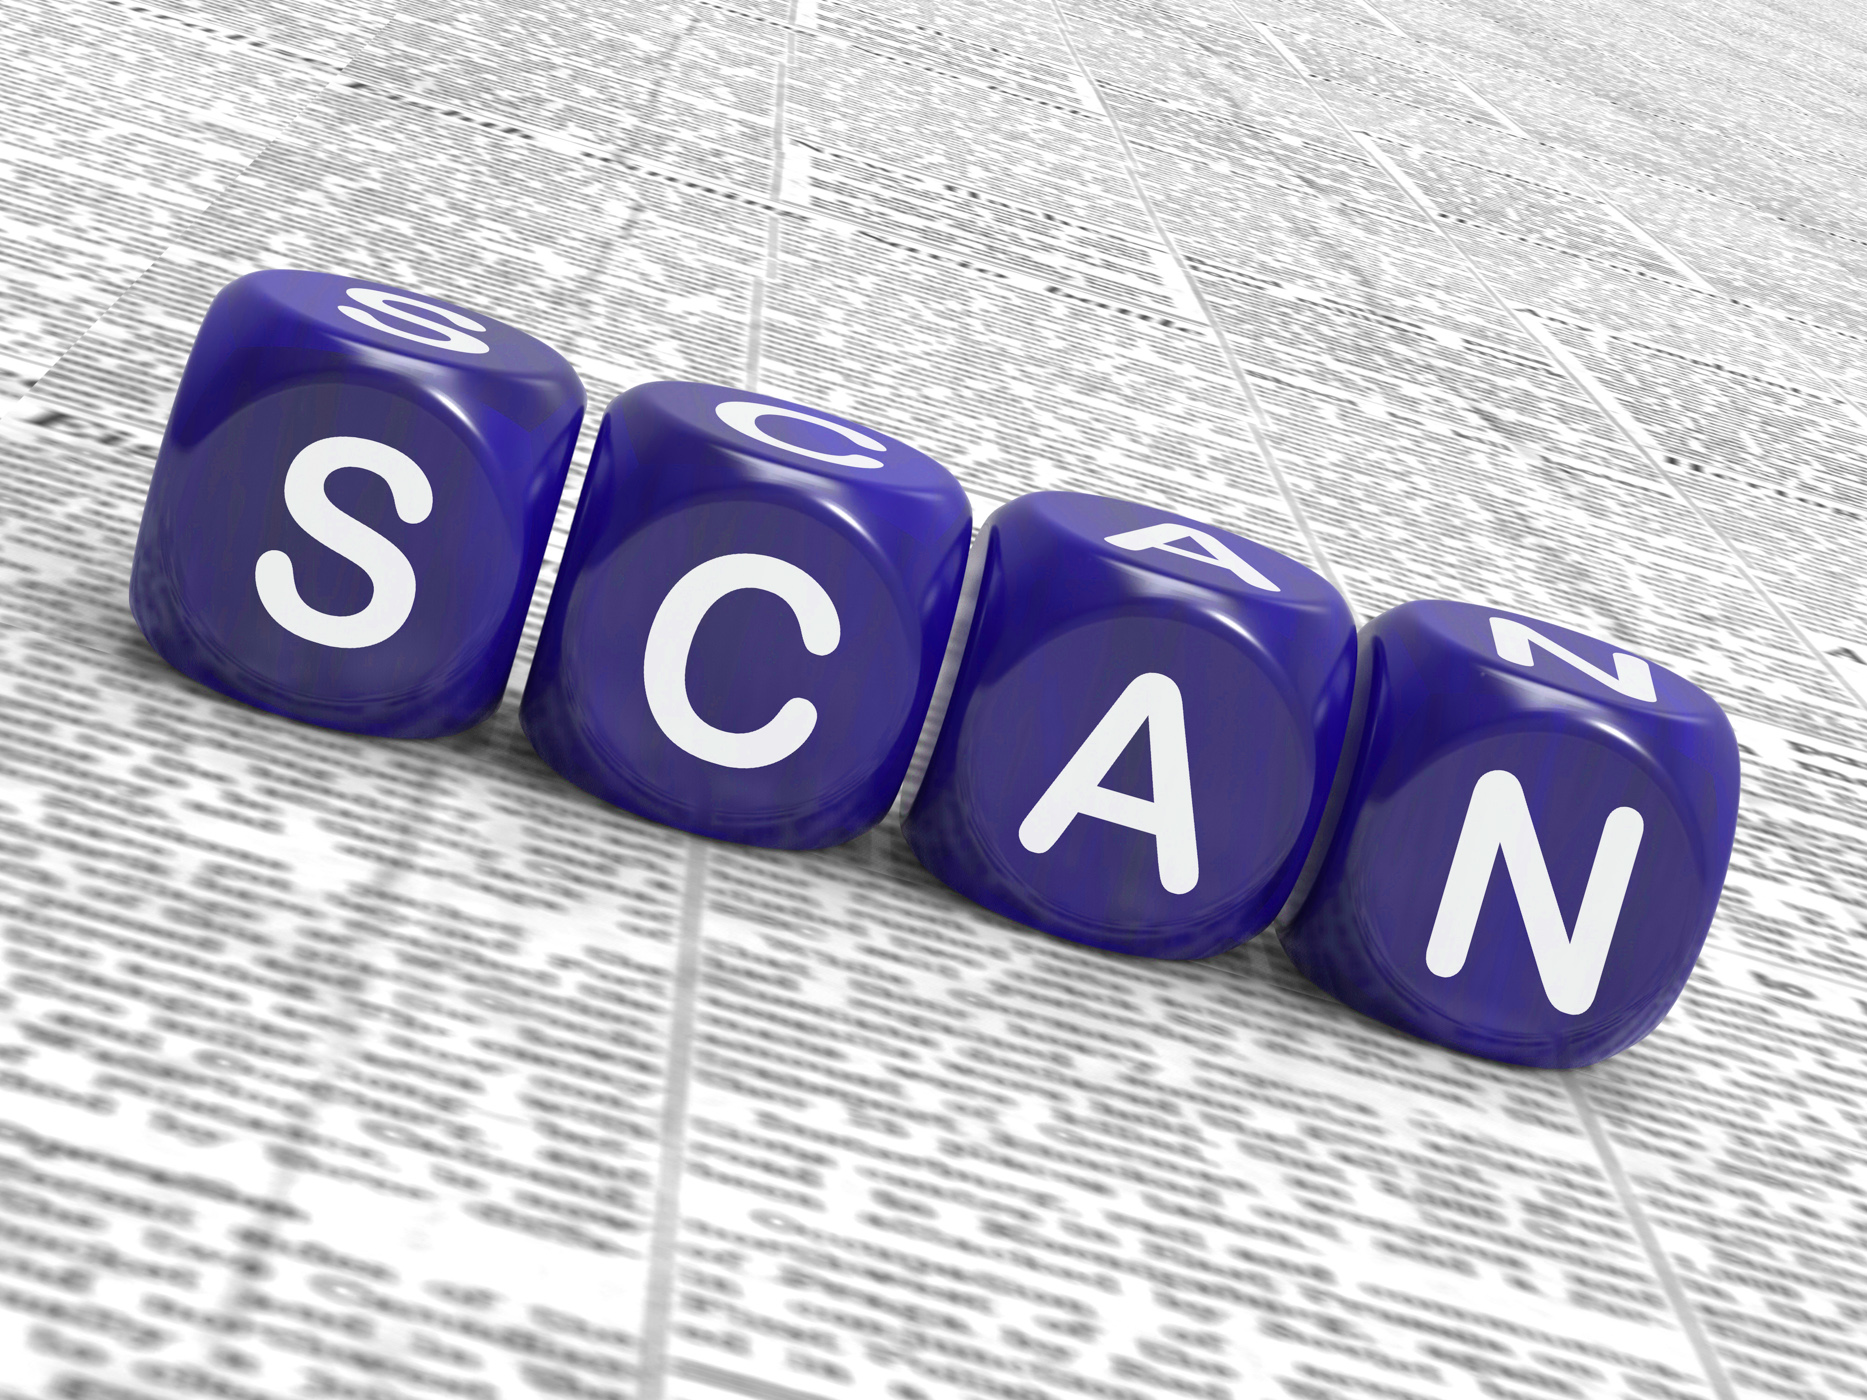 Scan dice show browse or flip through photo